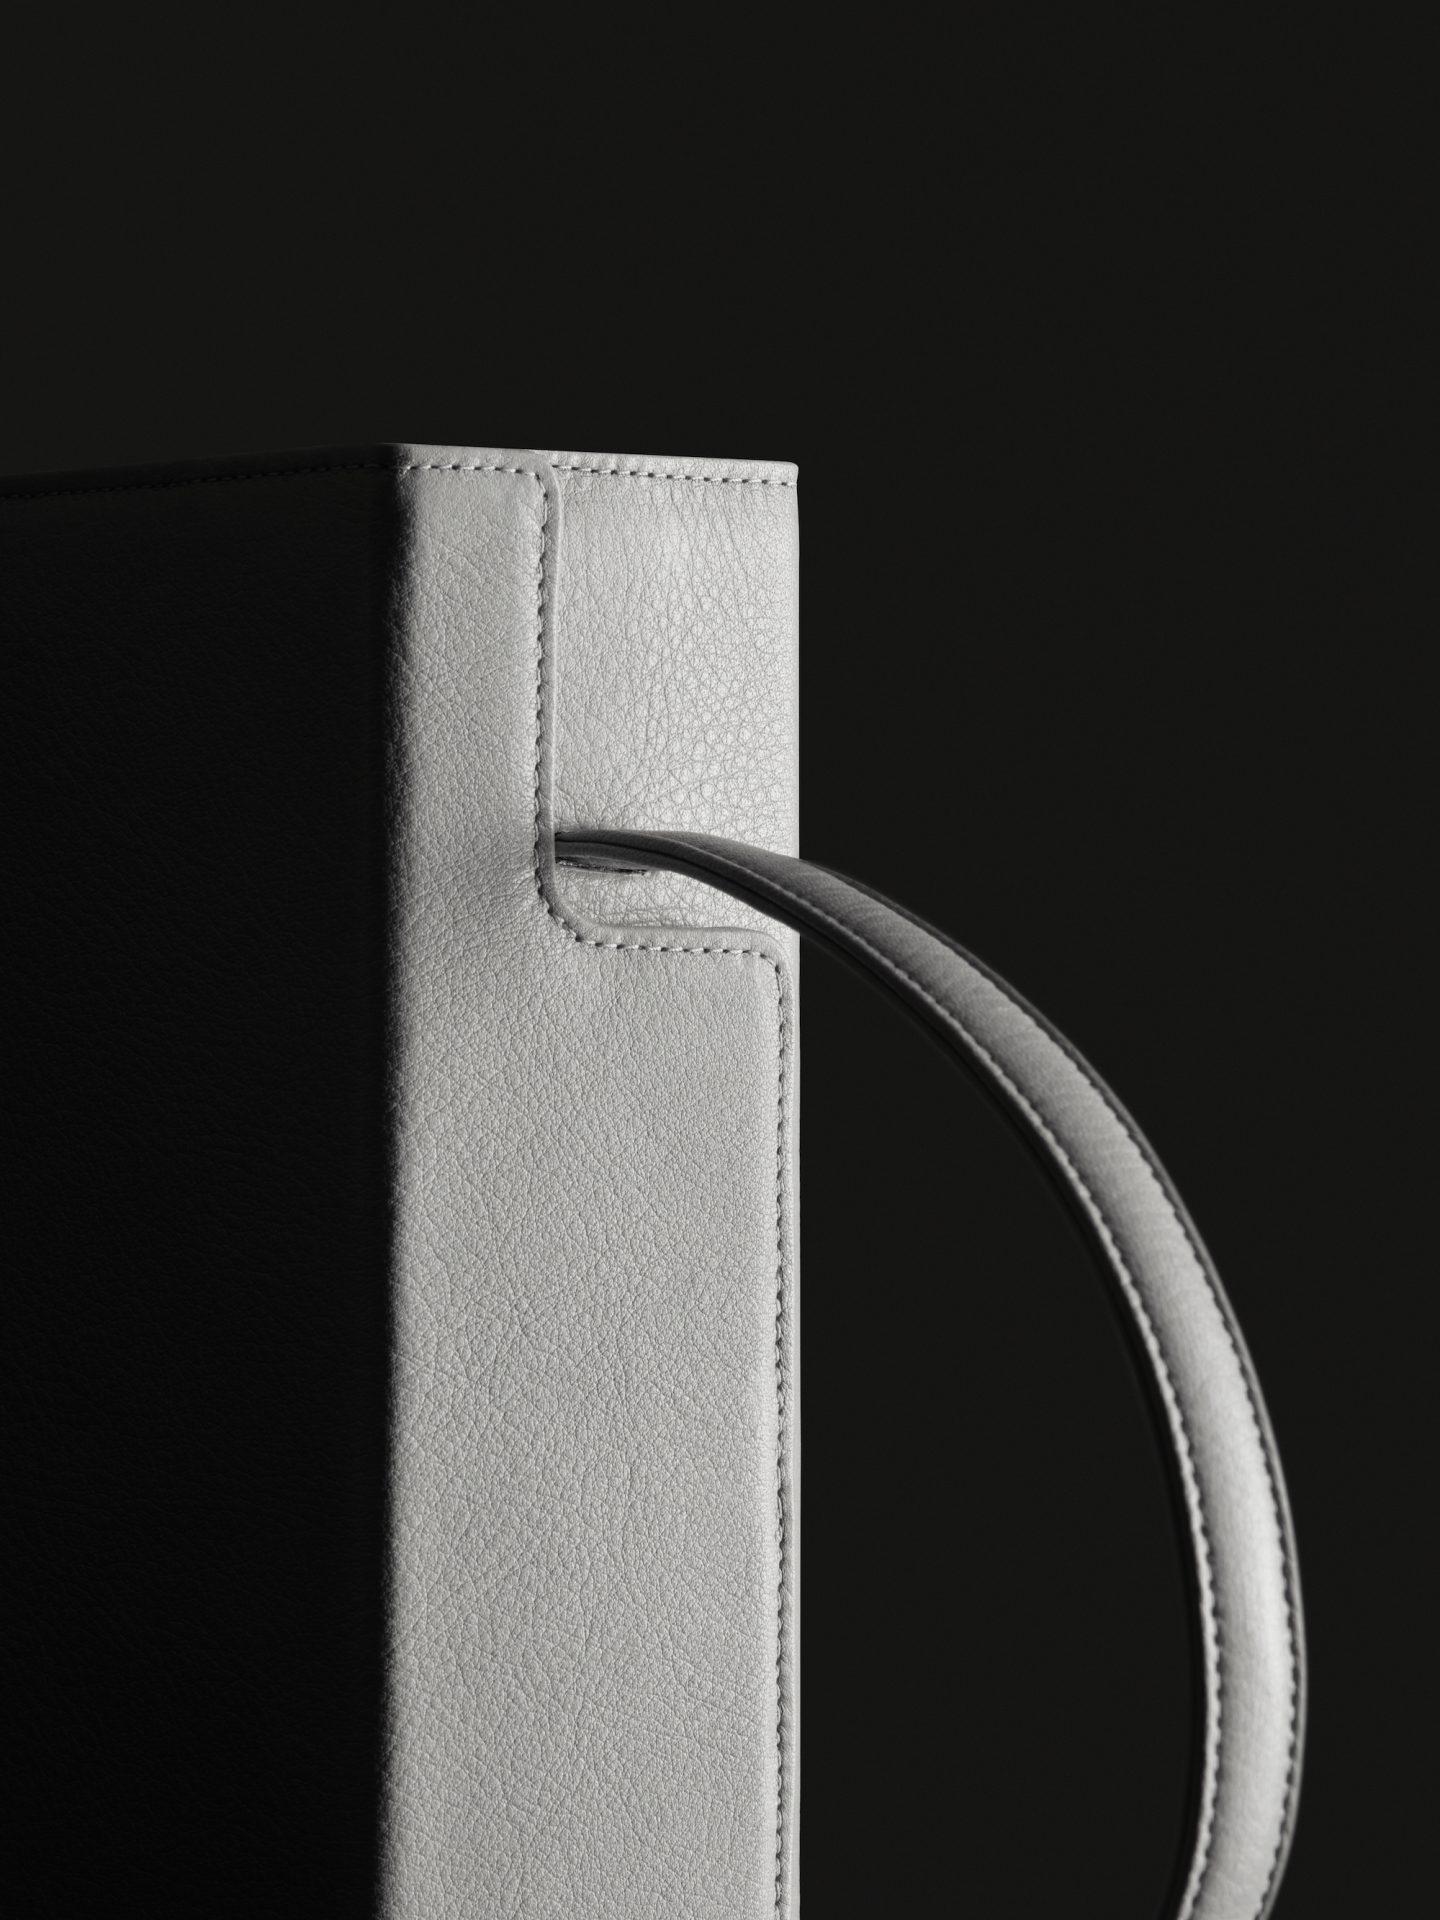 IGNANT-Design-Tsatsas-Dieter-Rams-931-012